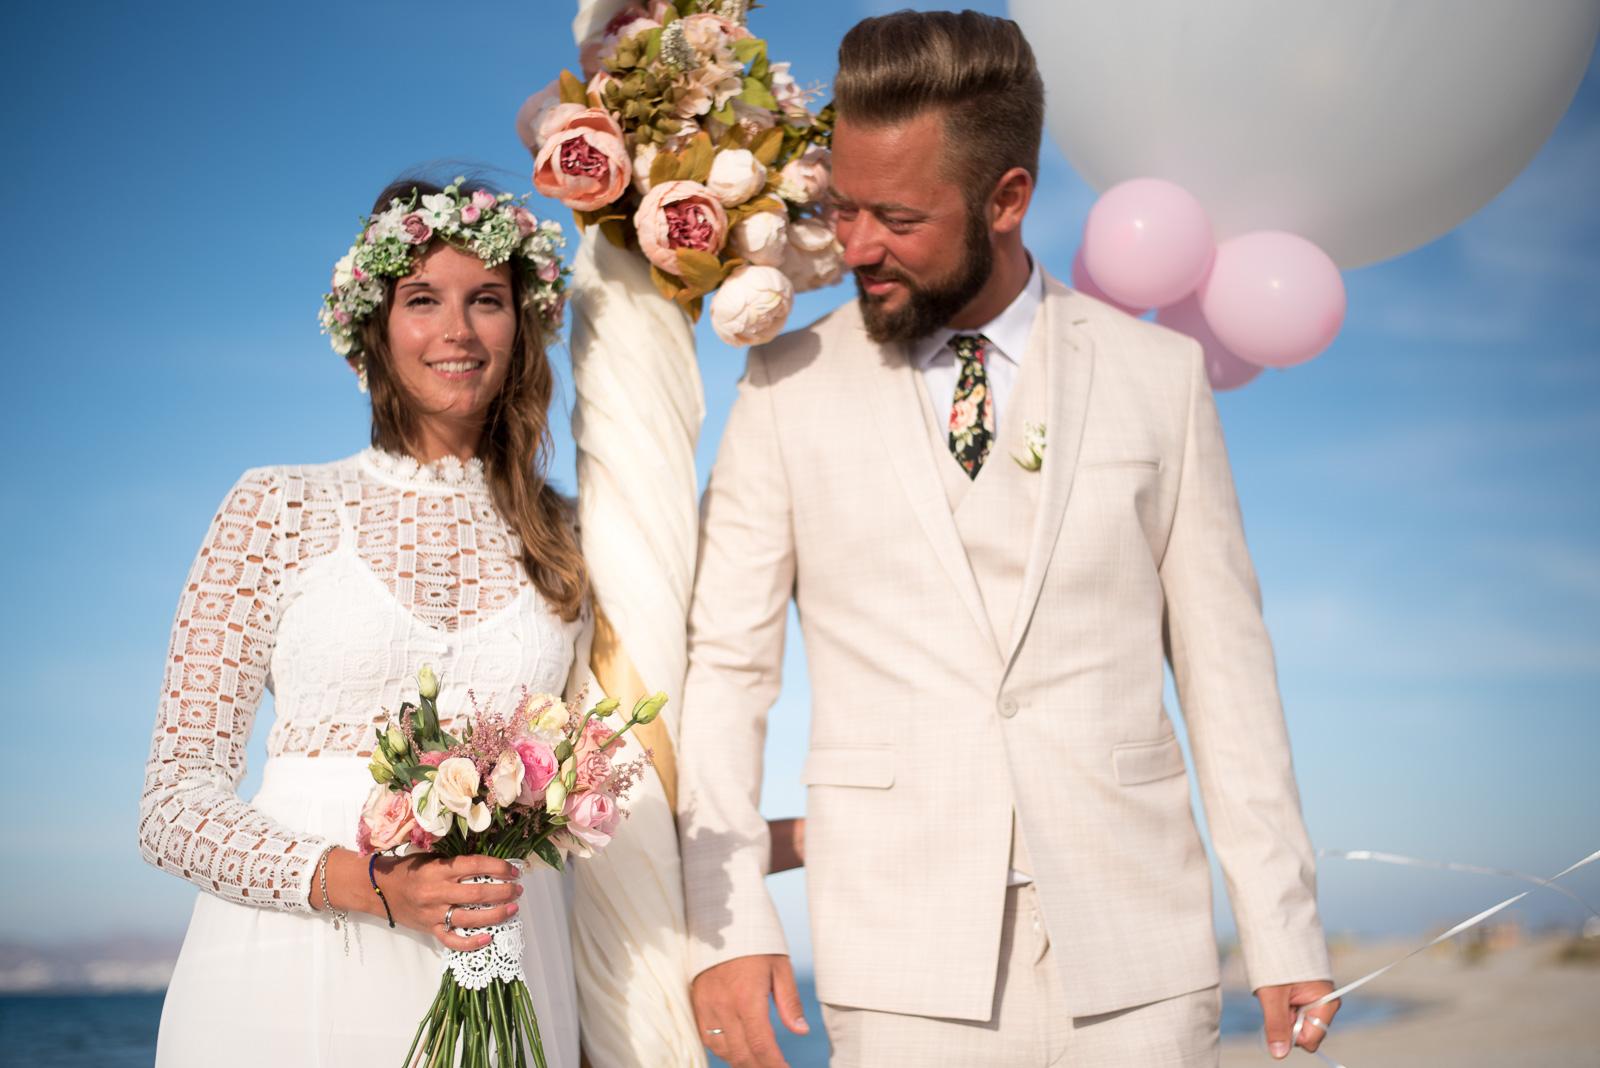 Wedding photographer in Greece, Kos island, Rhodes, Santorini, MykonosWedding photographer in Greece, Kos island, Rhodes, Santorini, Mykonos